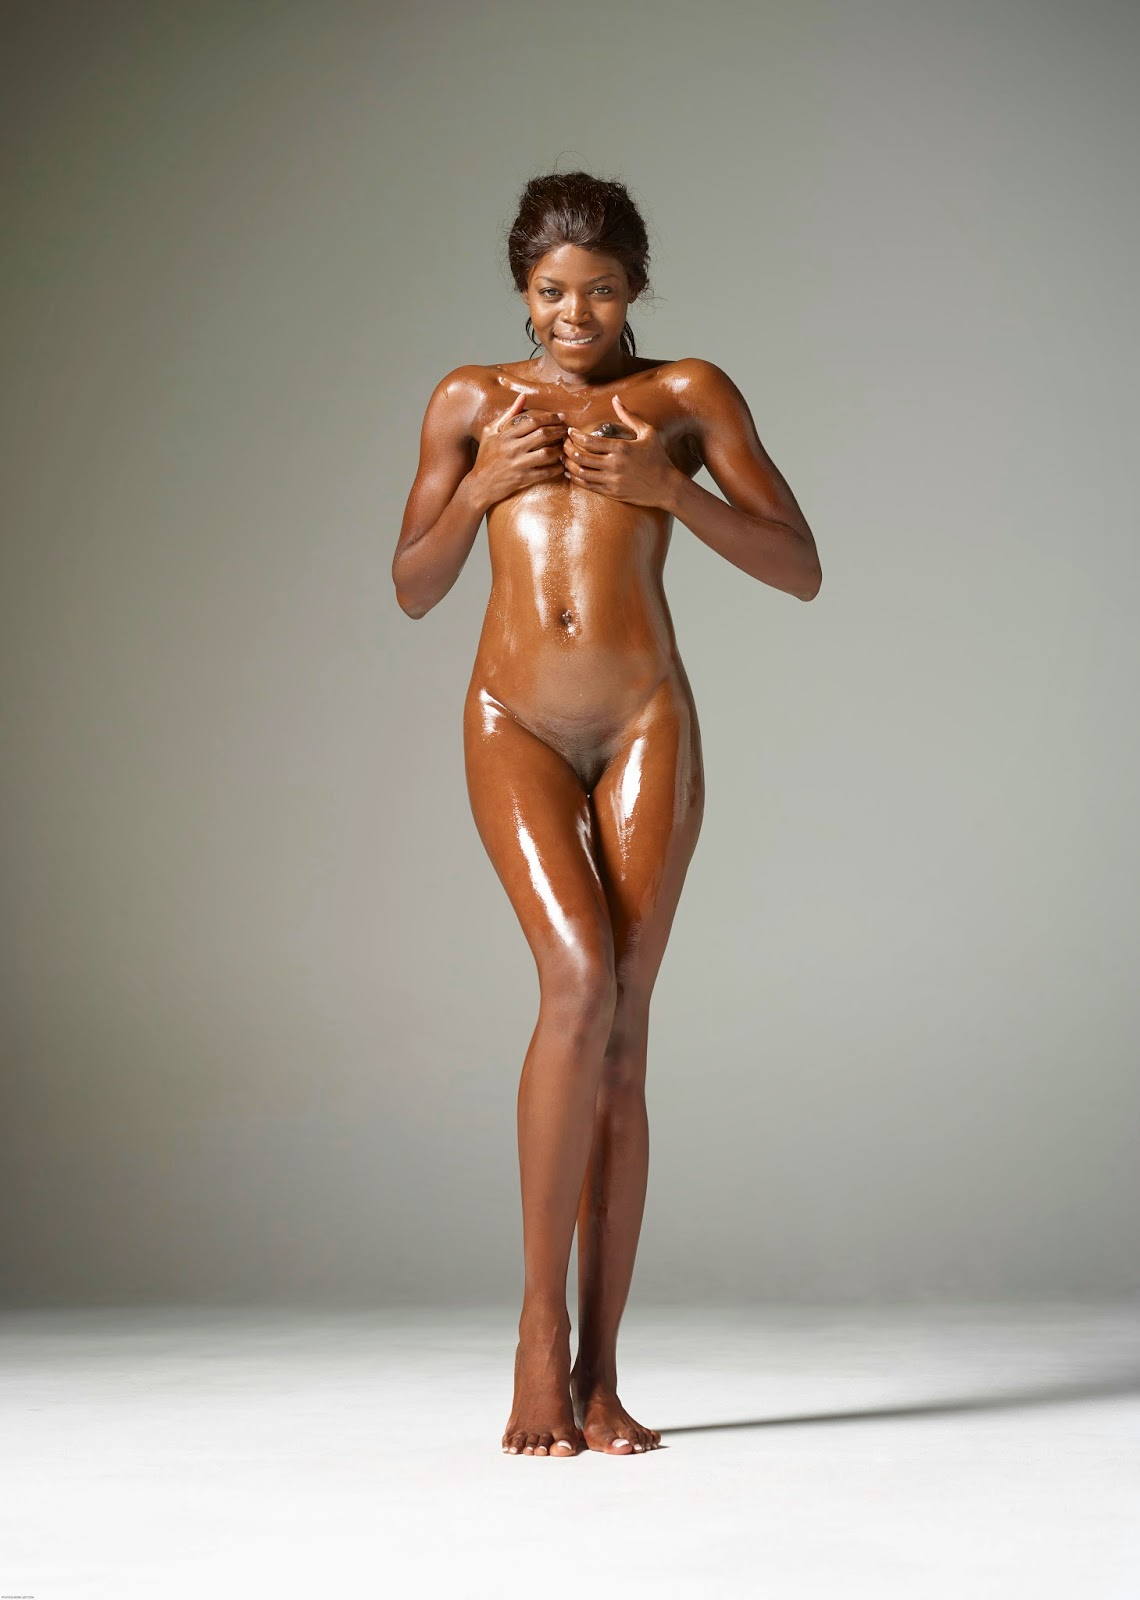 Nude 16: Hegre-Art Simone Creamed-October 01 2014